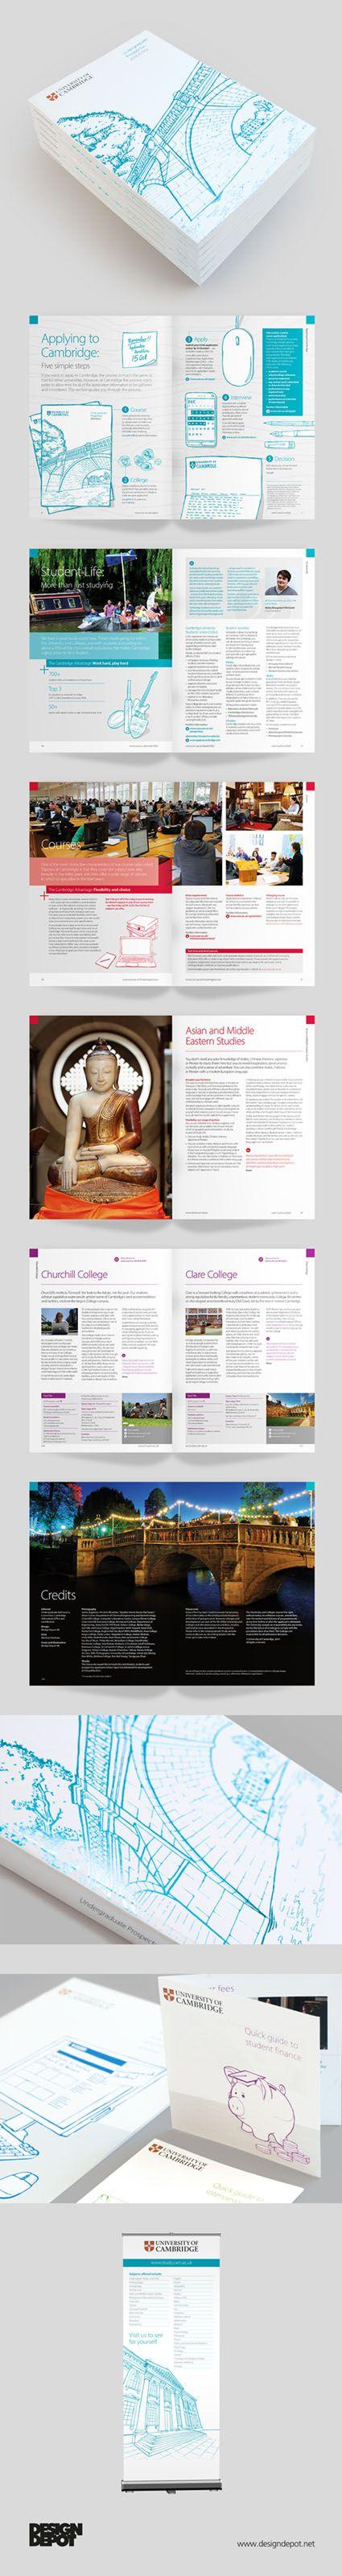 Cambridge University prospectus, artwork, learning, university, identity, branding, design depot, prospectus, education, graphics, Northamptonshire #DesignDepot